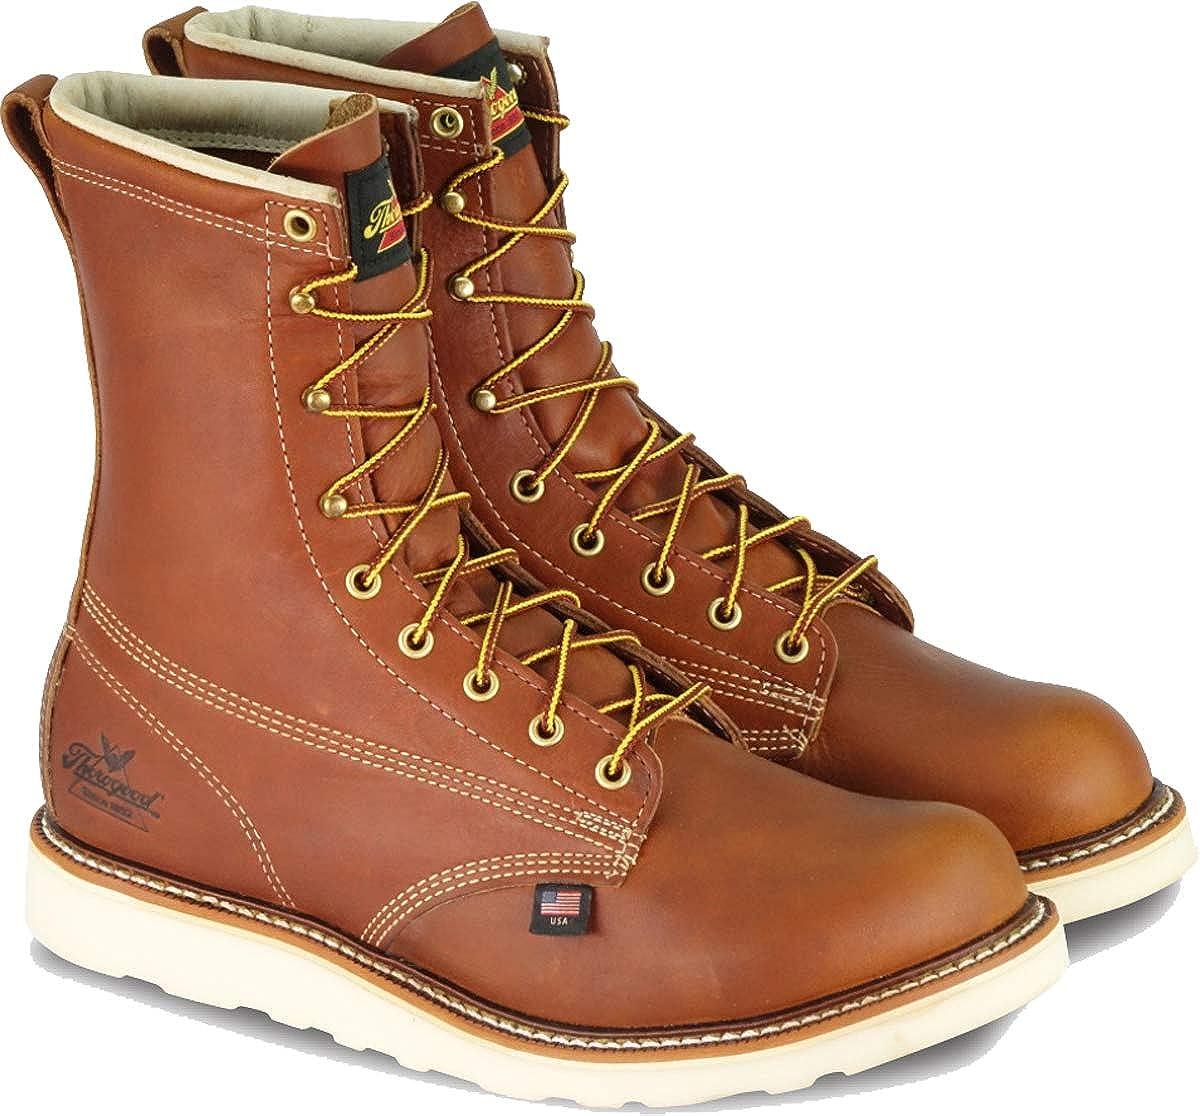 Thorogood Mens American Heritage 8 Round Toe MAXWear Wedge Non-Safety Toe Boot American Heritage Plain Toe